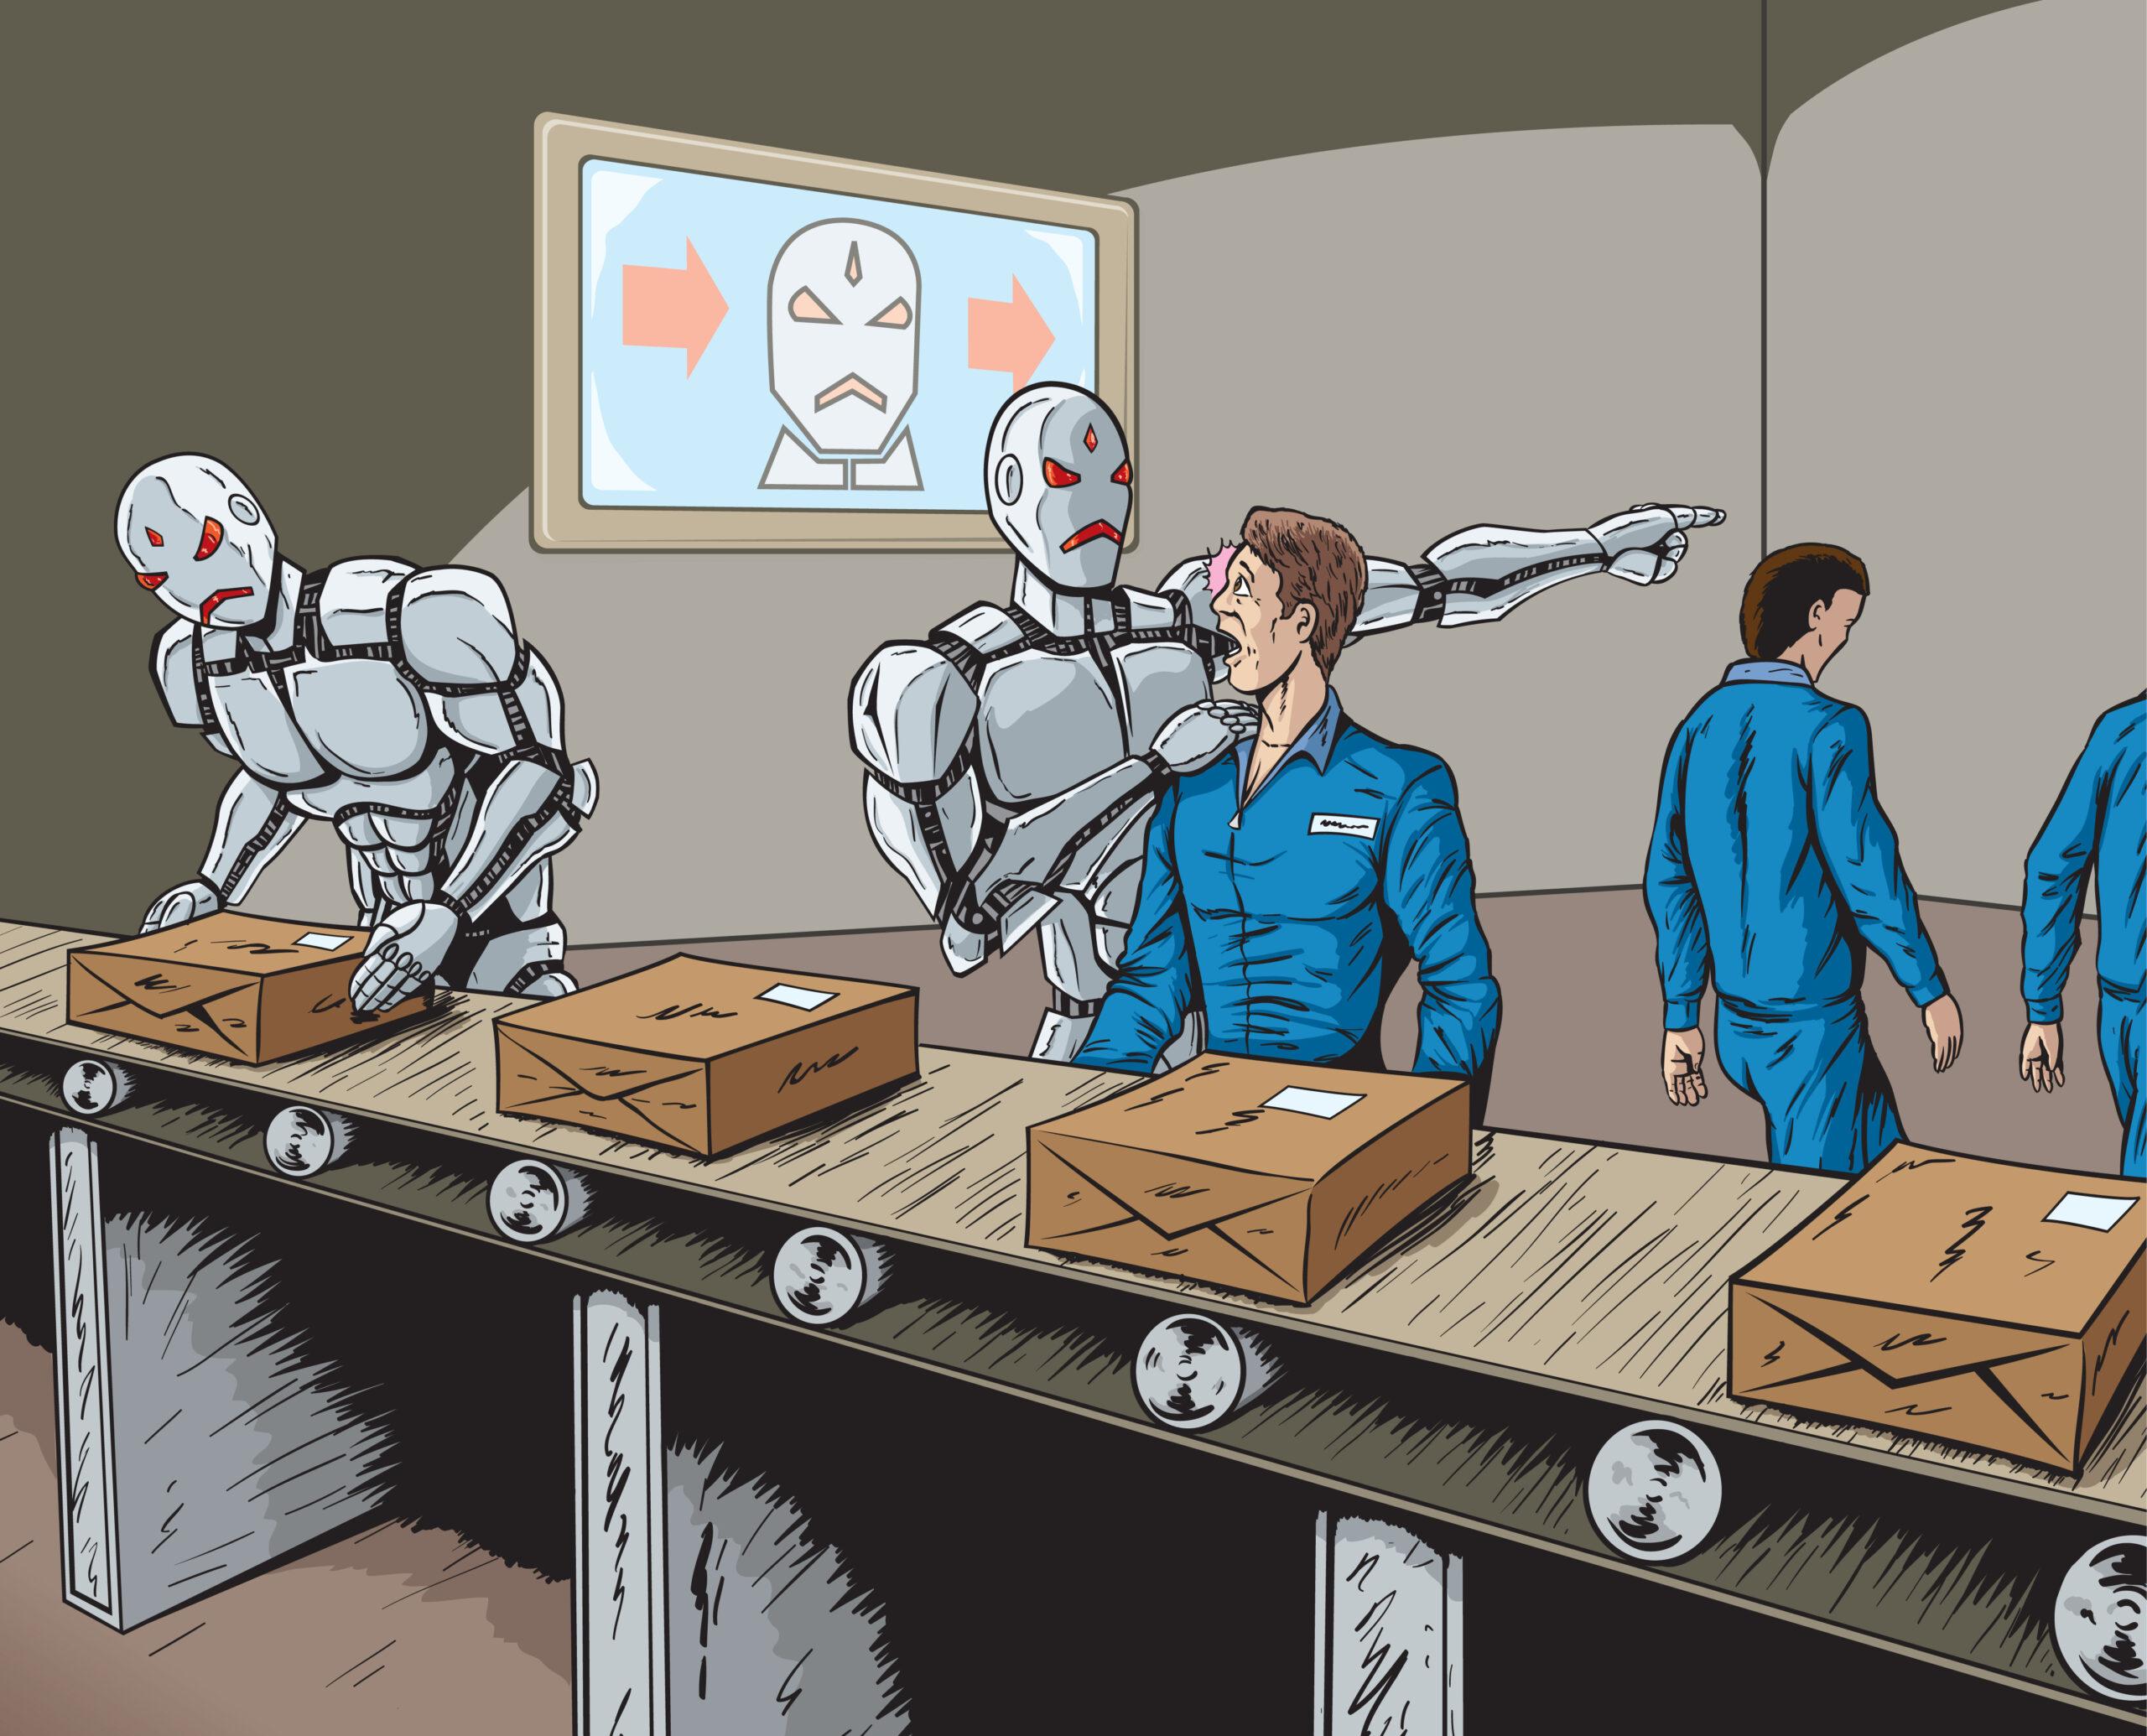 robot-humanos-trabajo